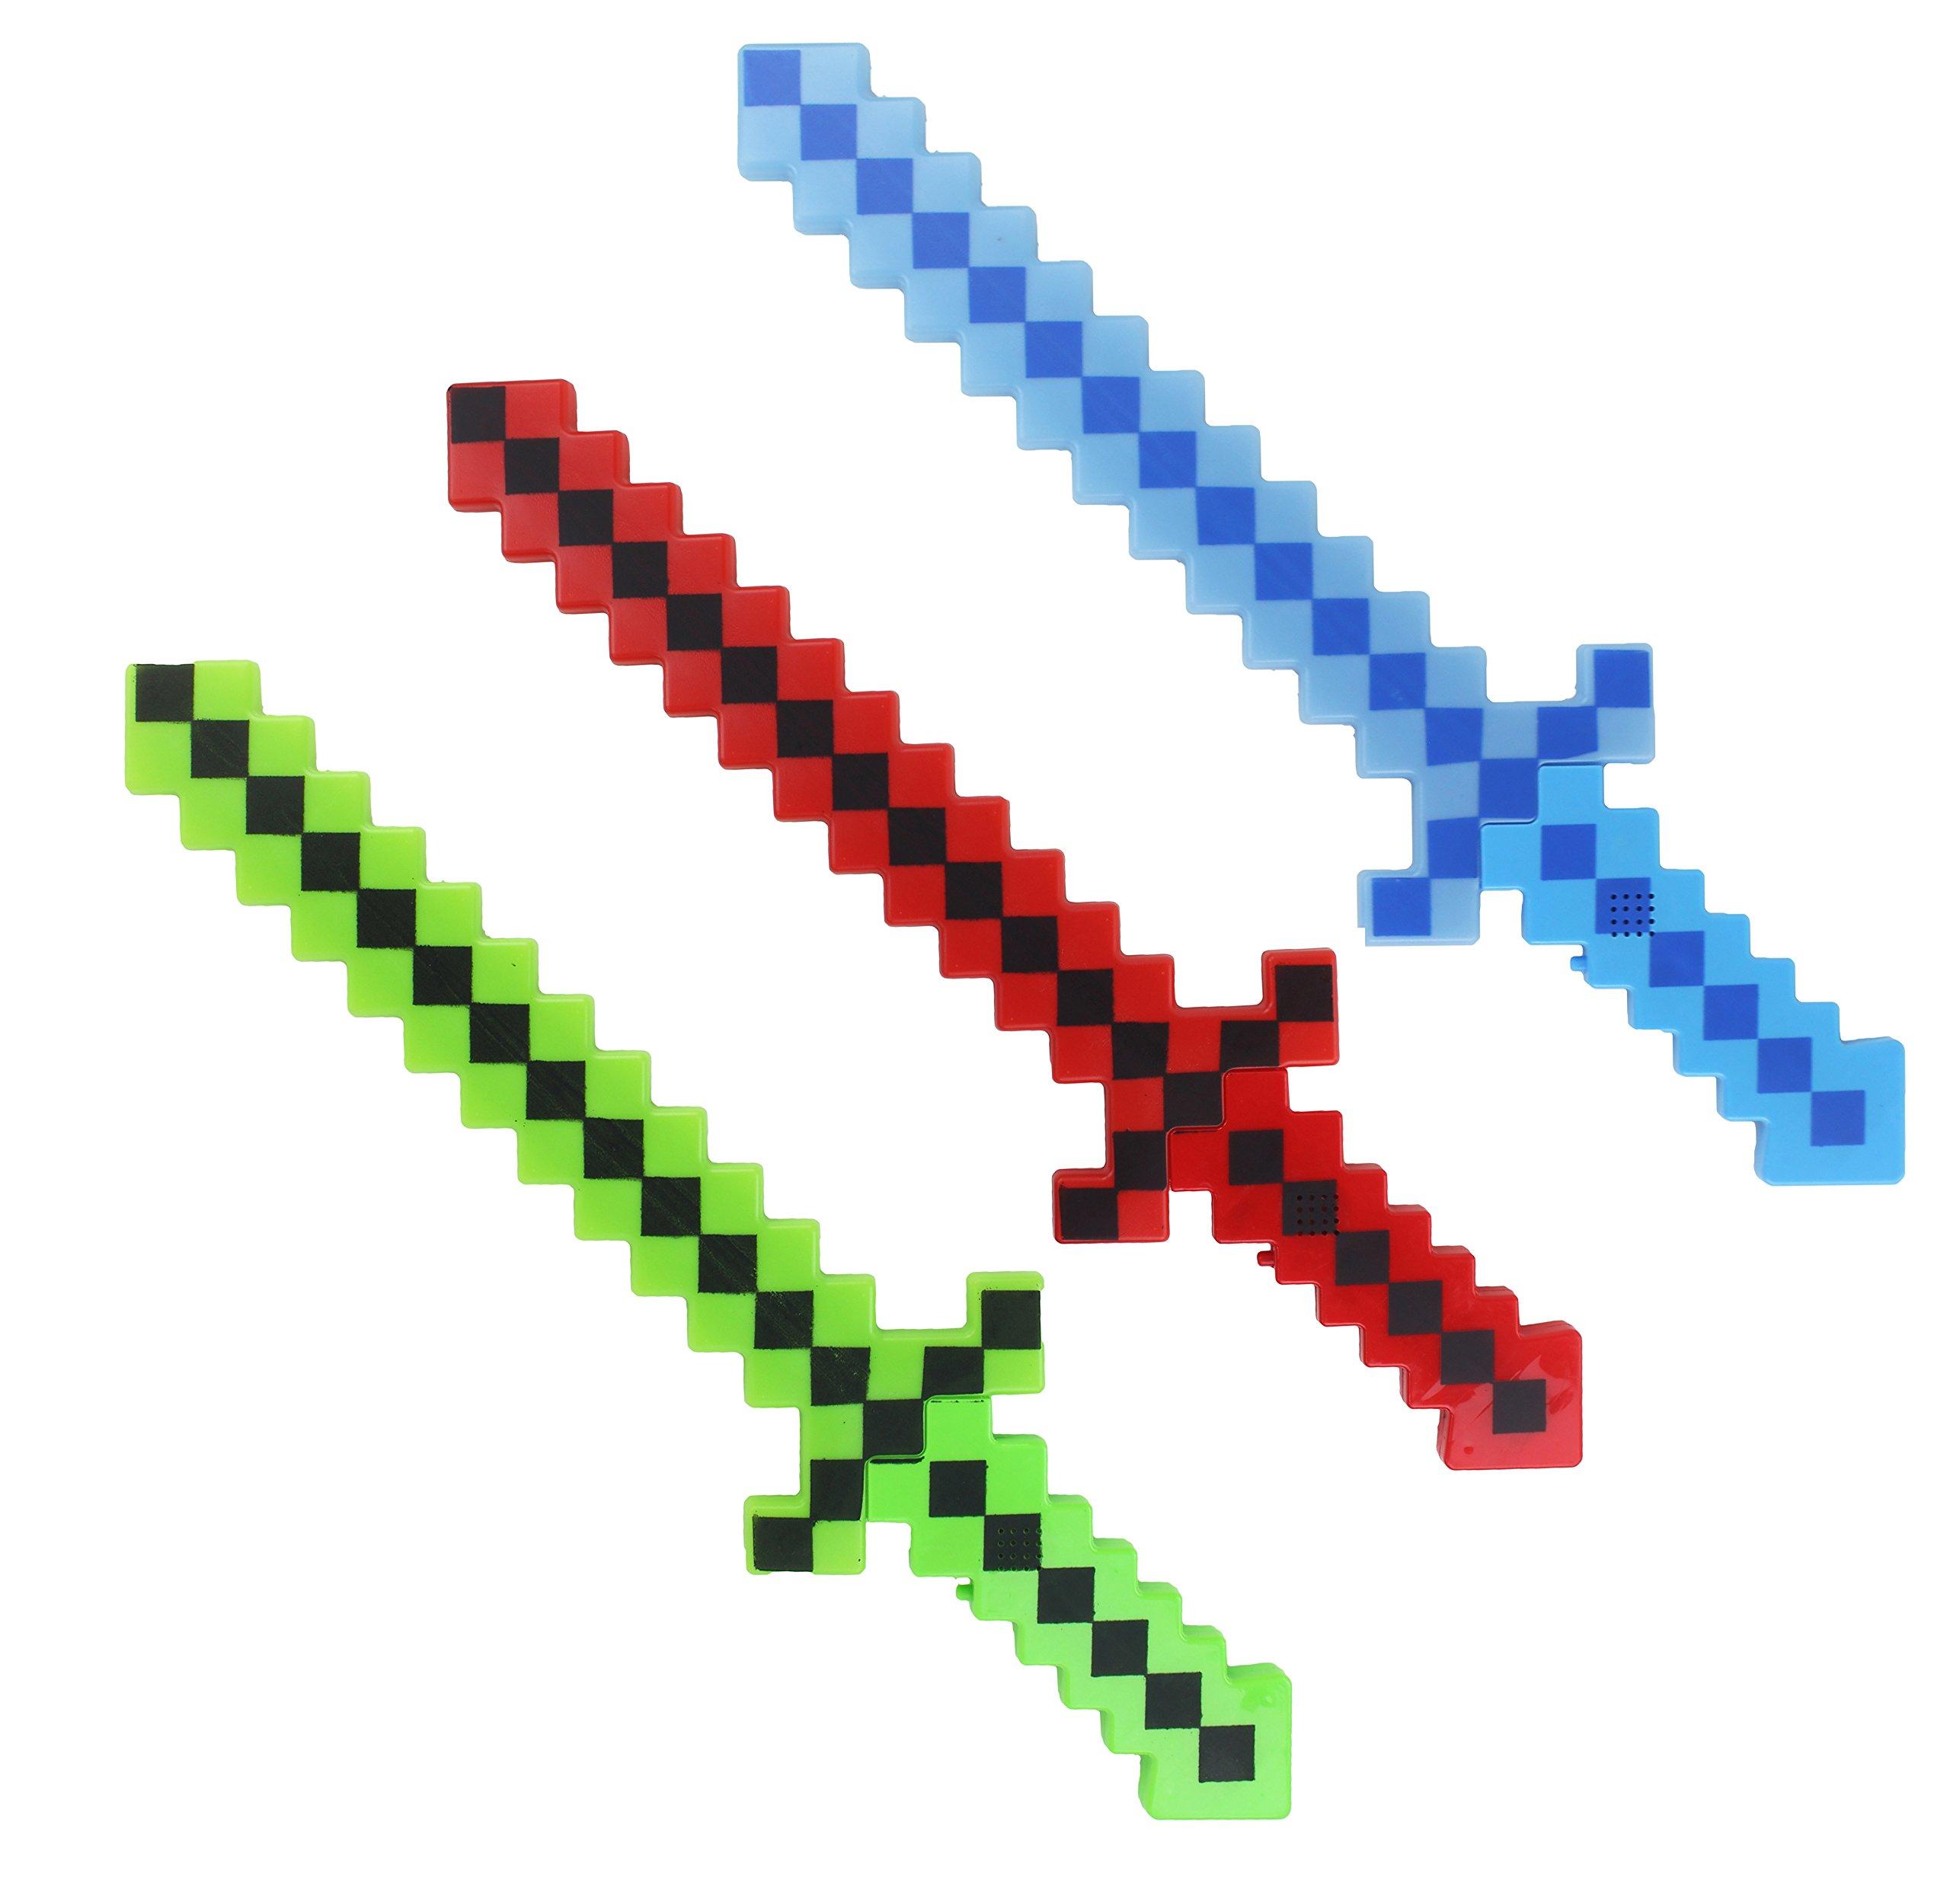 8 Bit 6 Pack Lumistick Light-up Diamond Pixel Sword - (Colors May Vary) 6 Pixelated Sword, Pixel Theme Toys, Electronic Sword, Light up Toys, Fun LED Pixel Toy Sword for Kids, Children 24 Inch